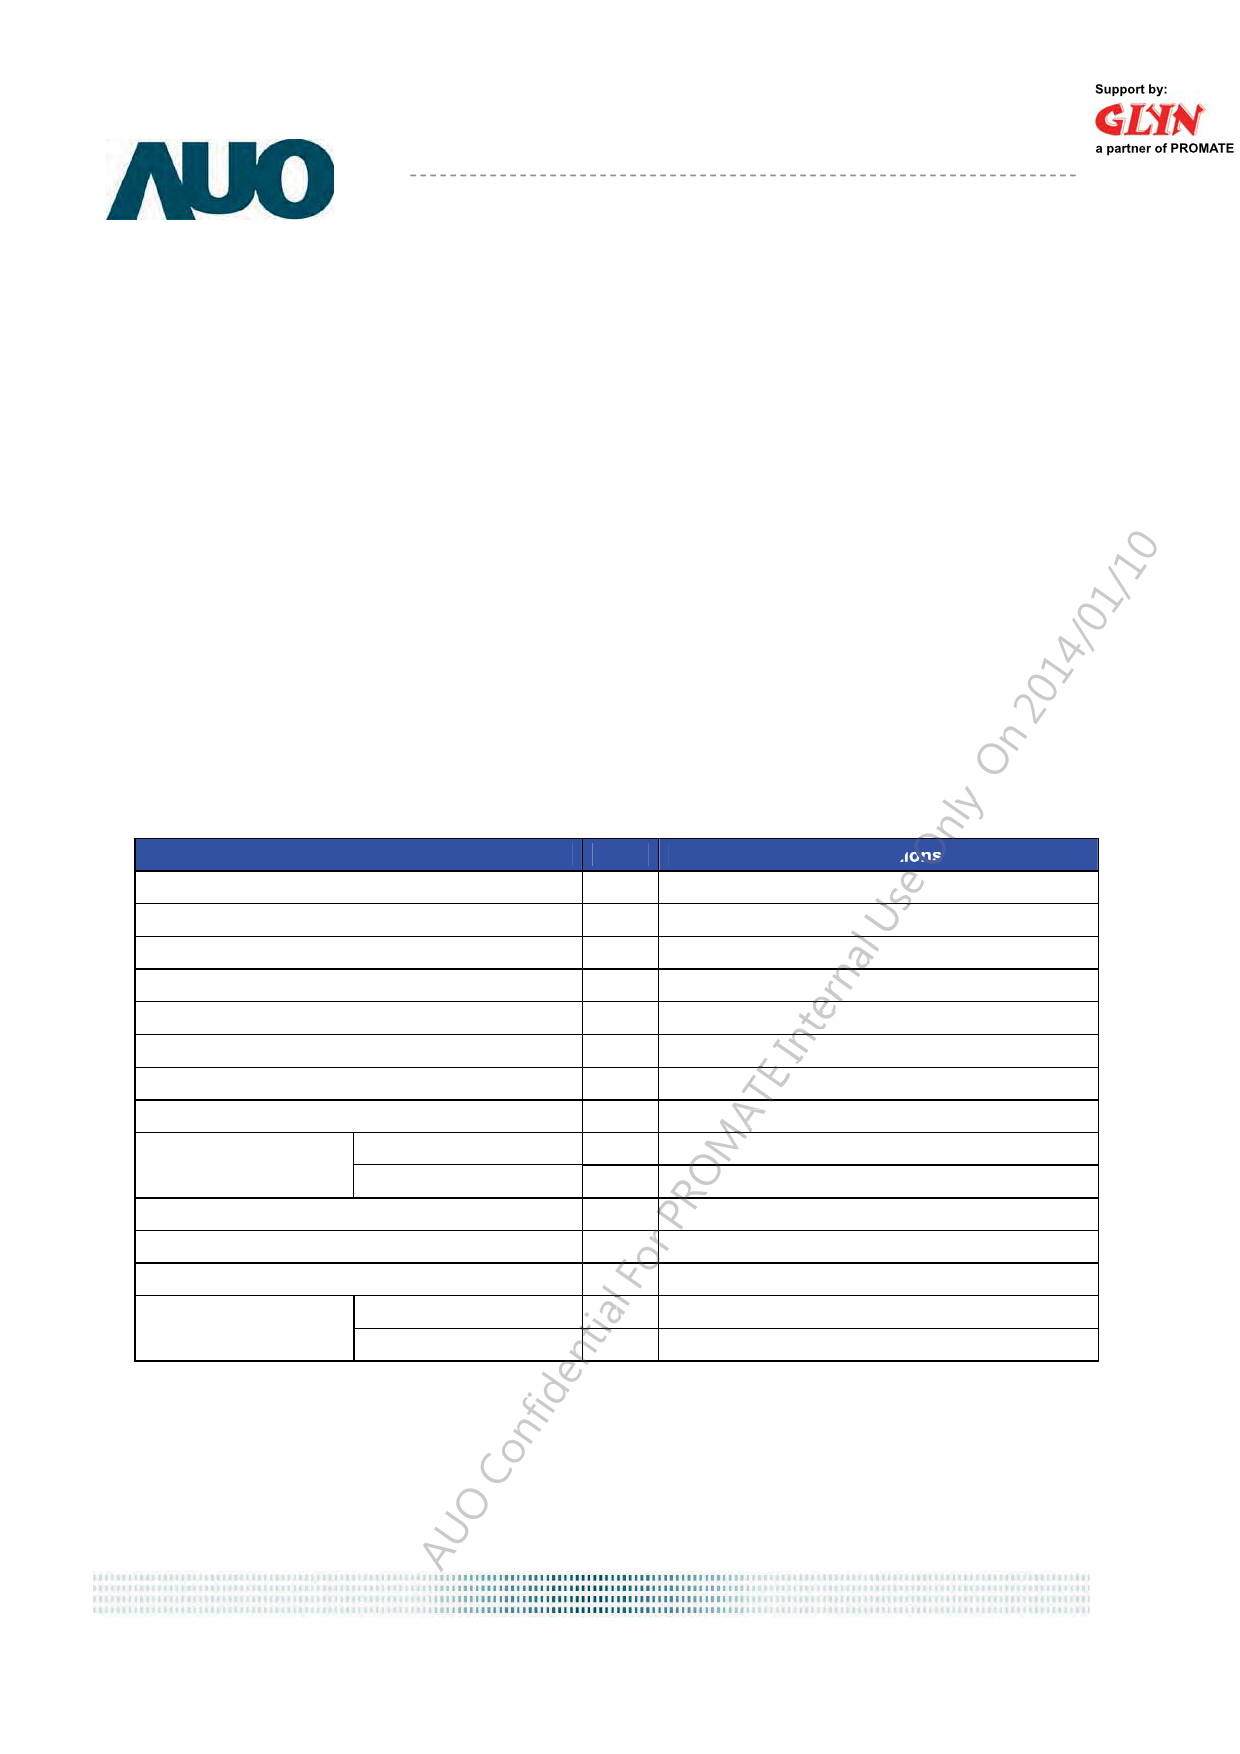 G070VVN01.100 pdf